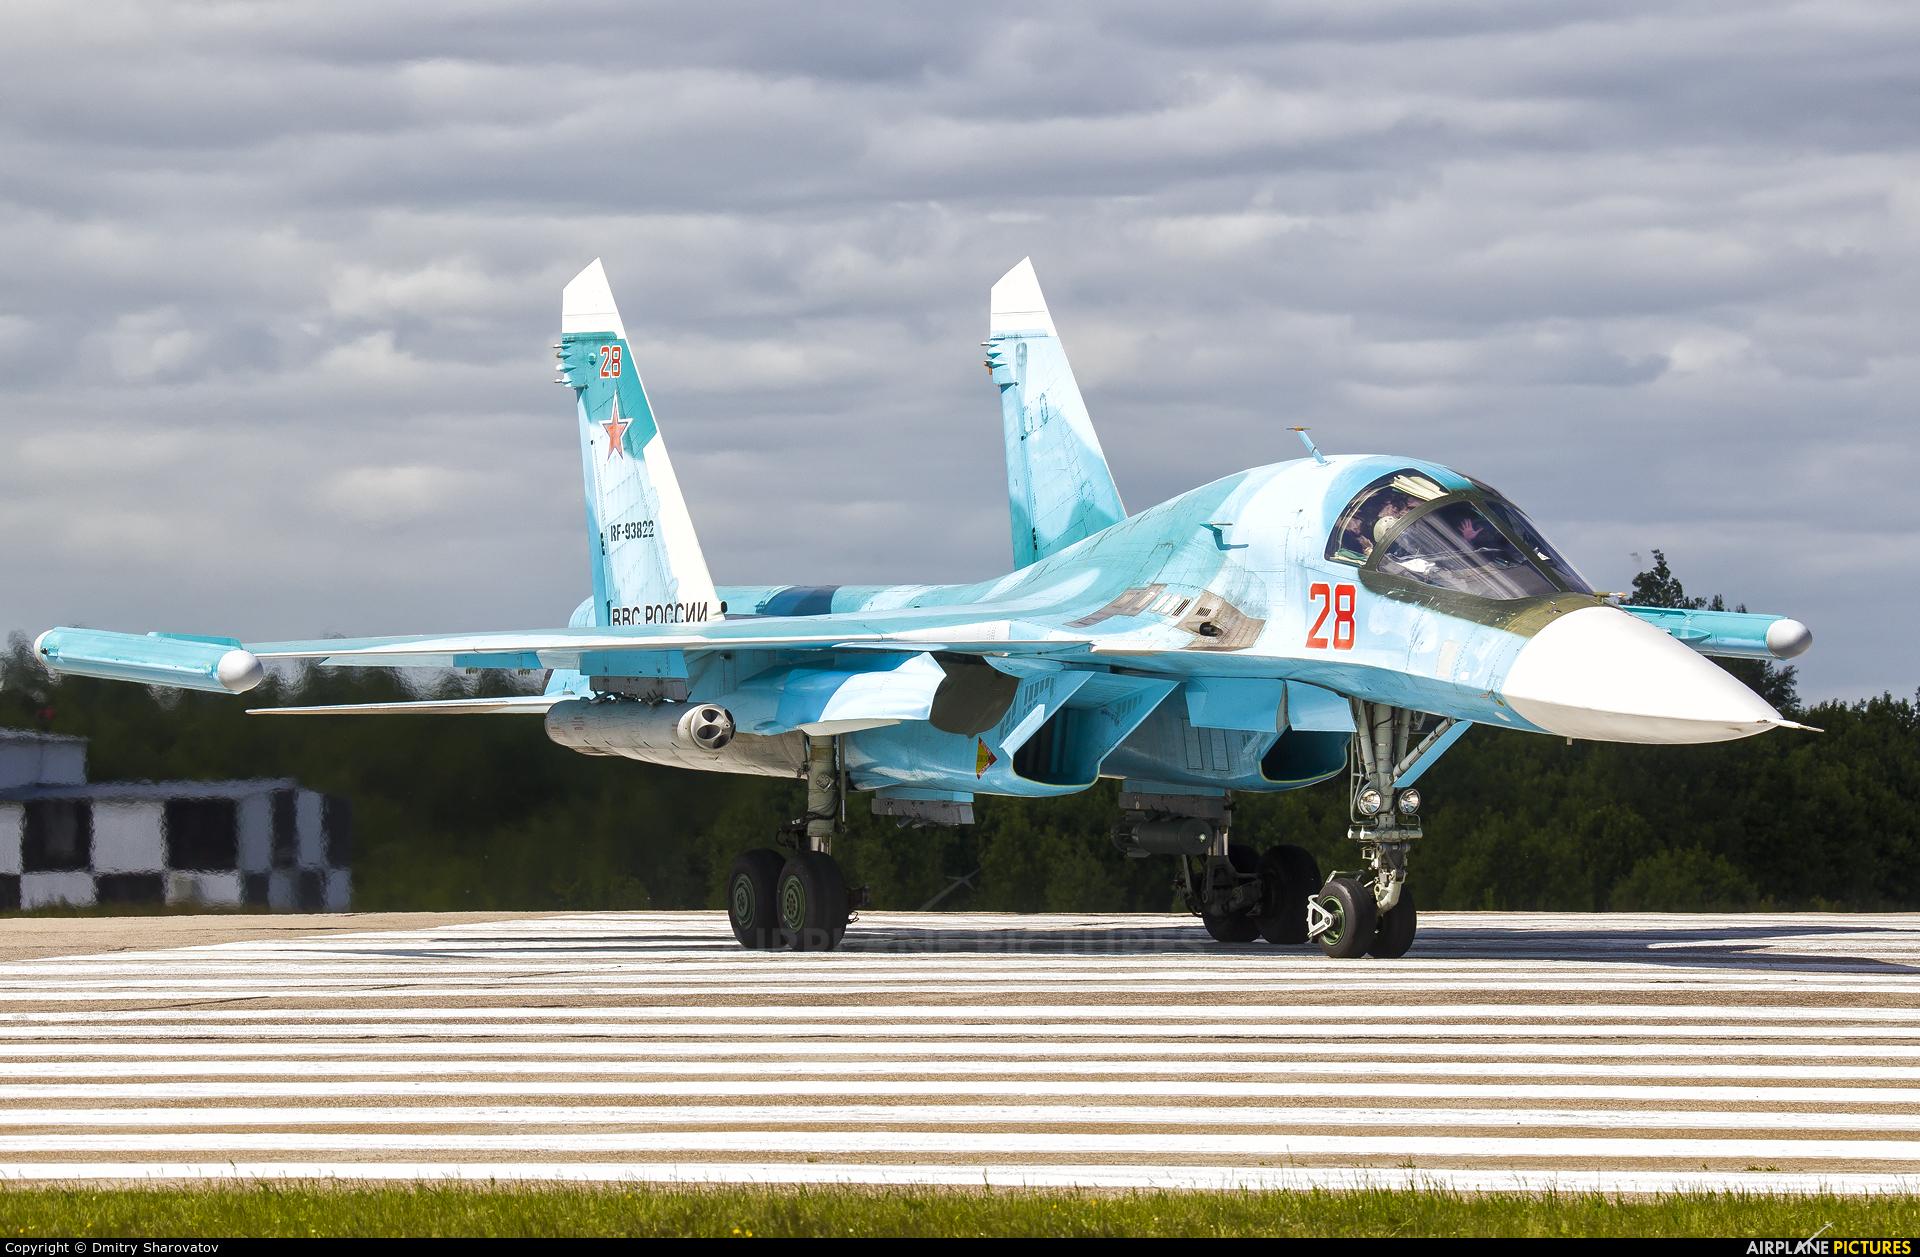 Russia - Air Force RF-93822 aircraft at Ryazan - Dyagilevo